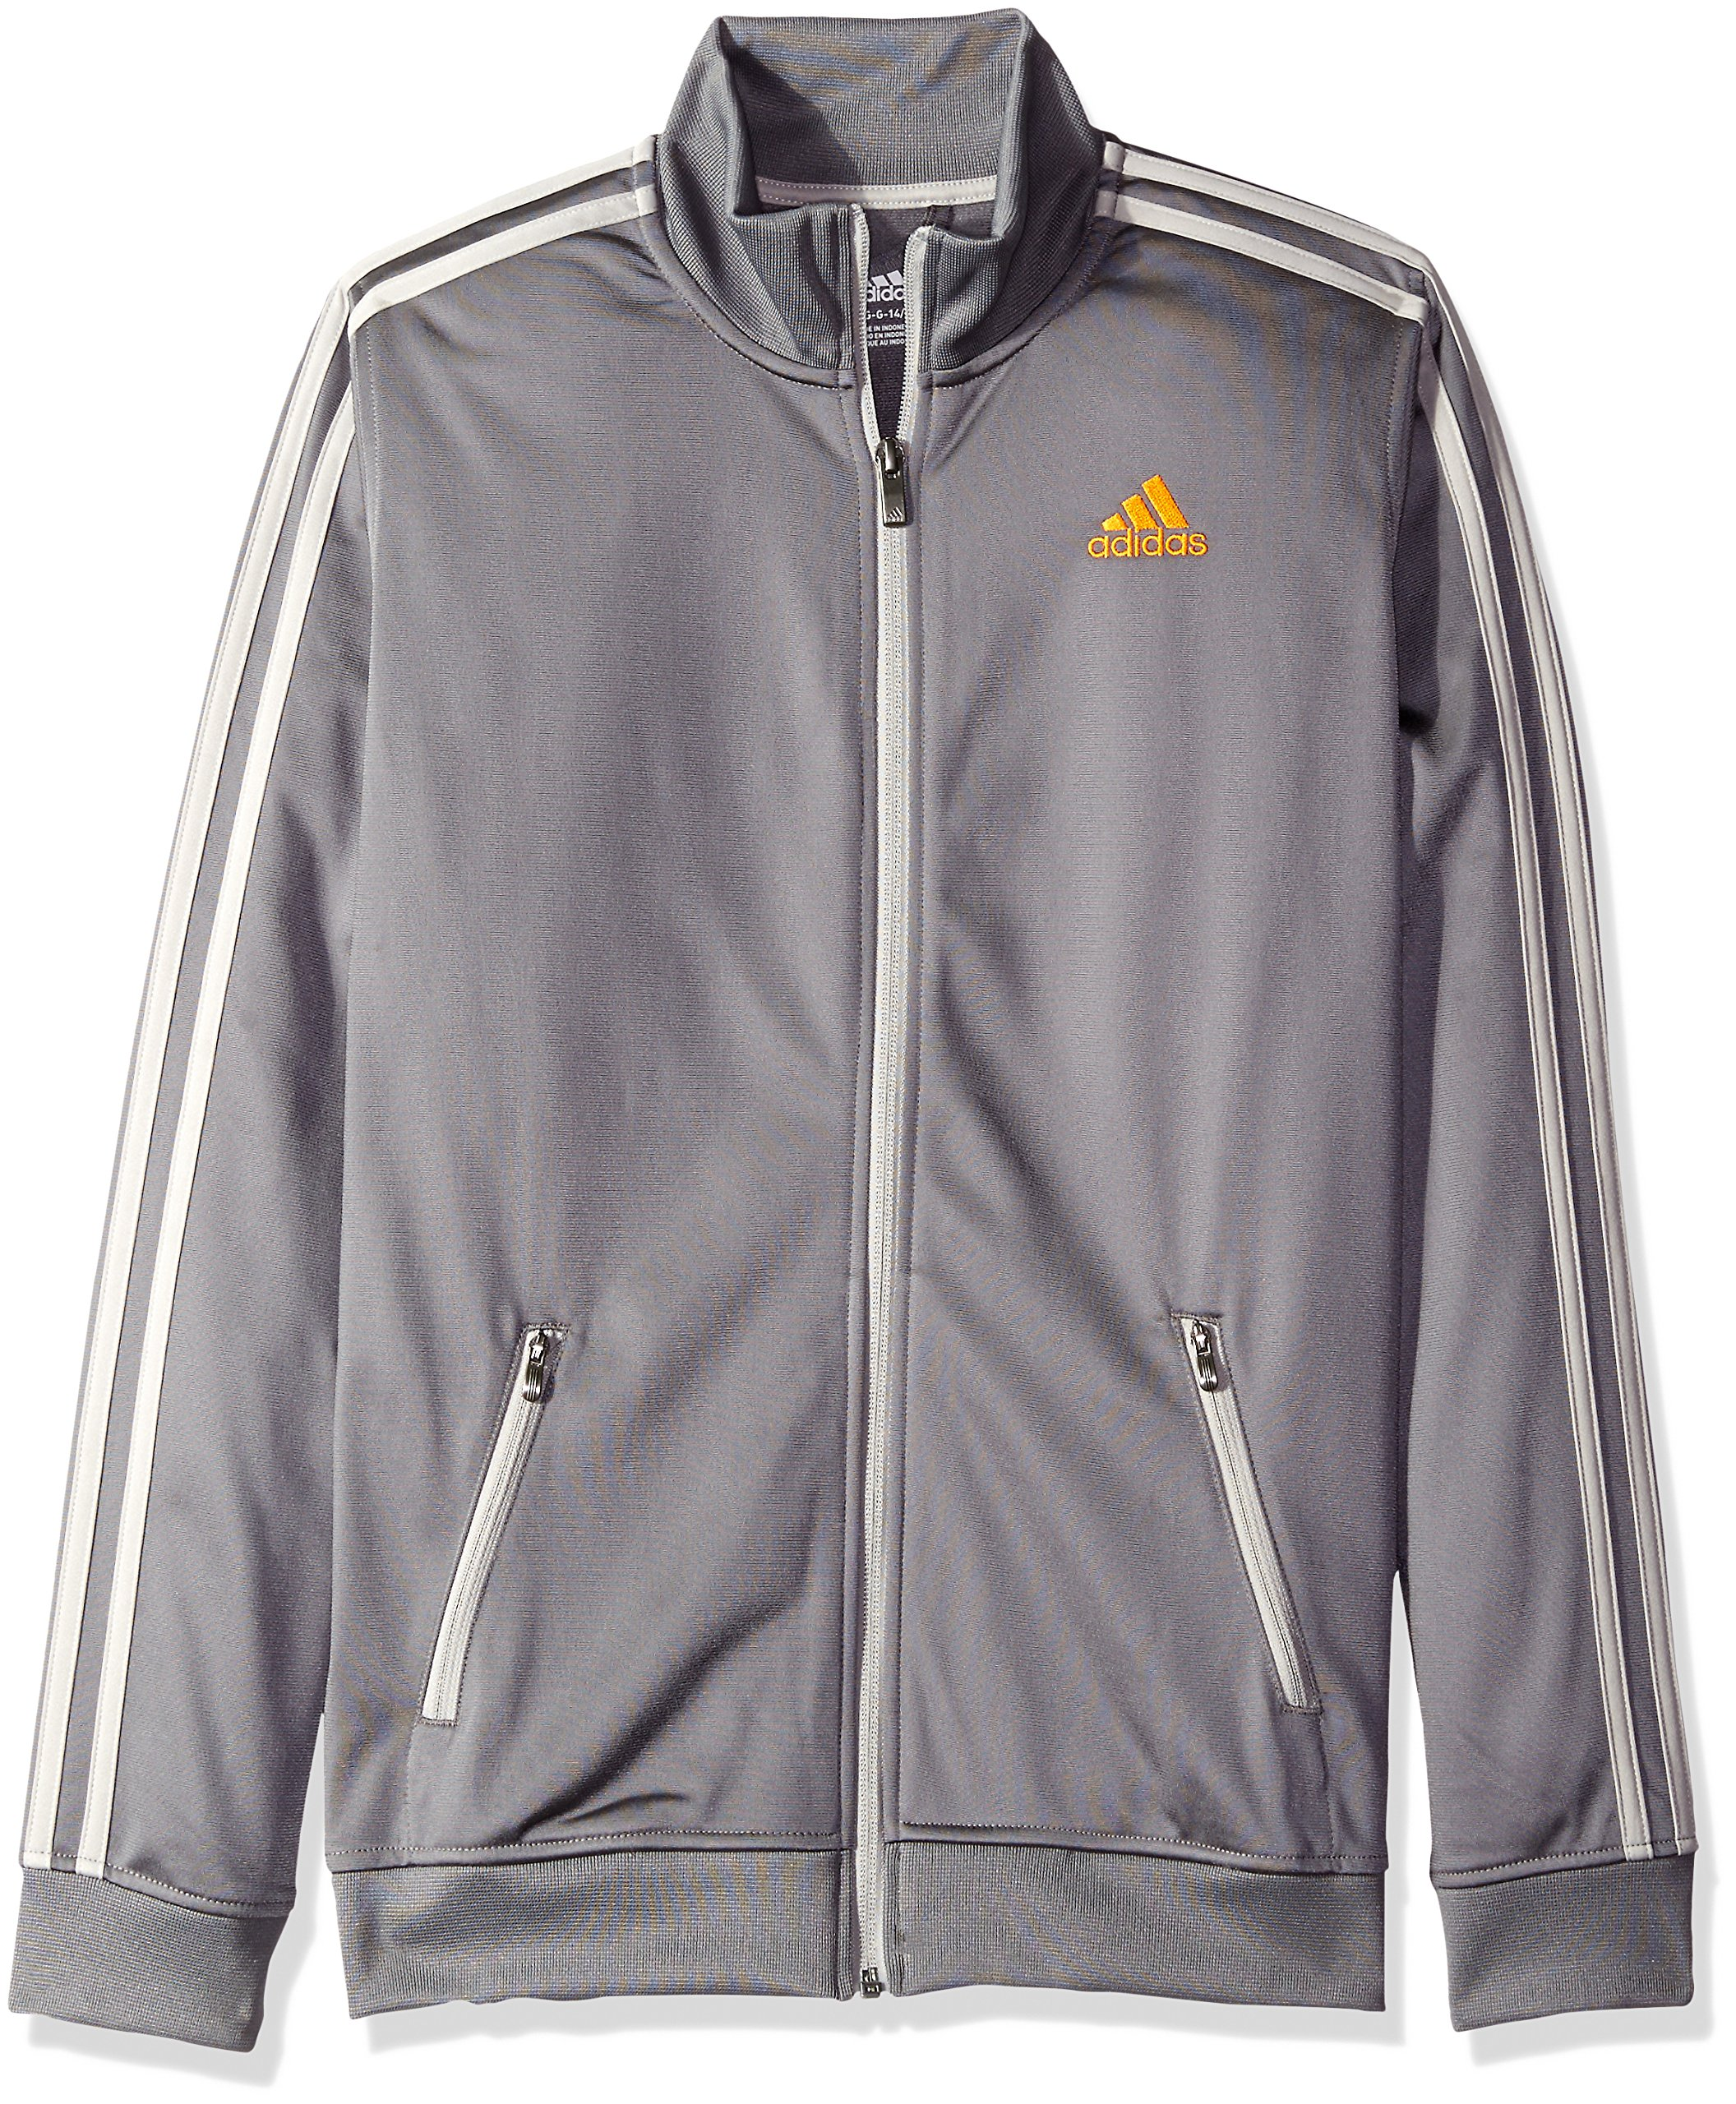 adidas Big Boys' Separates Training Track Jacket, Granite/MGH, Small/8